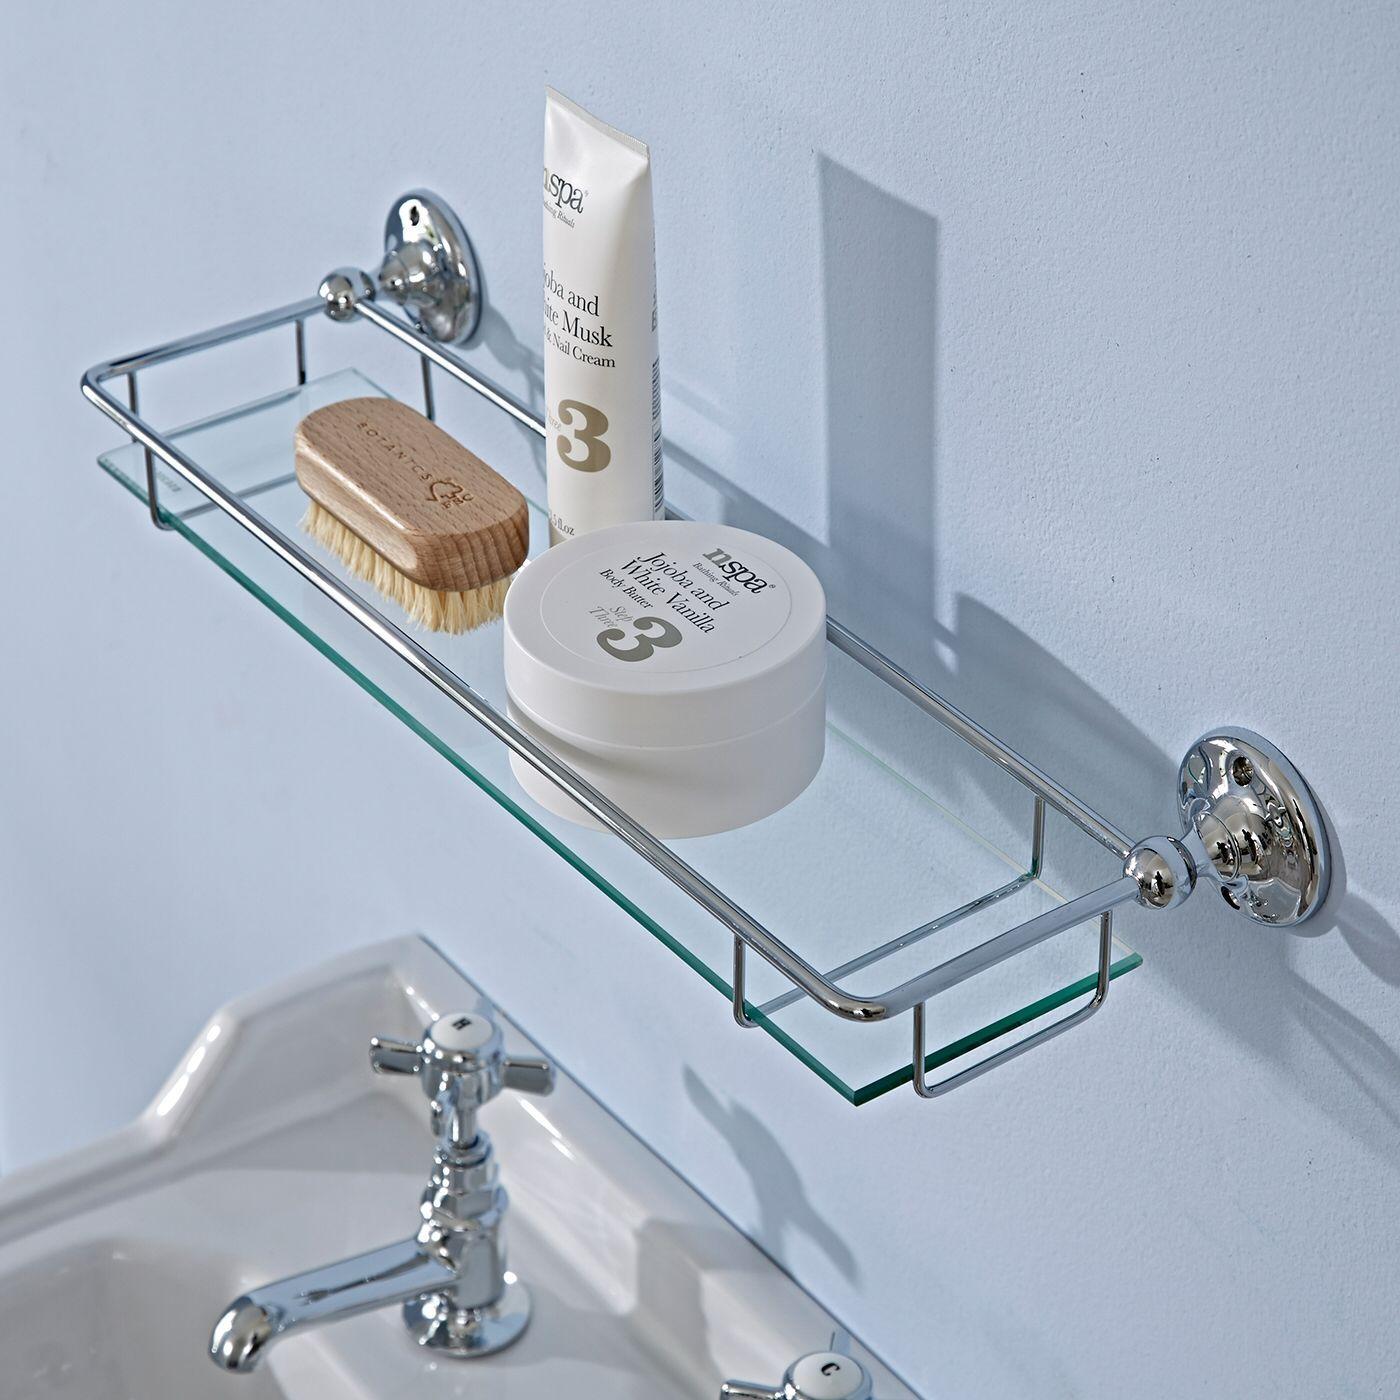 glass gallery shelf chrome finish. Black Bedroom Furniture Sets. Home Design Ideas